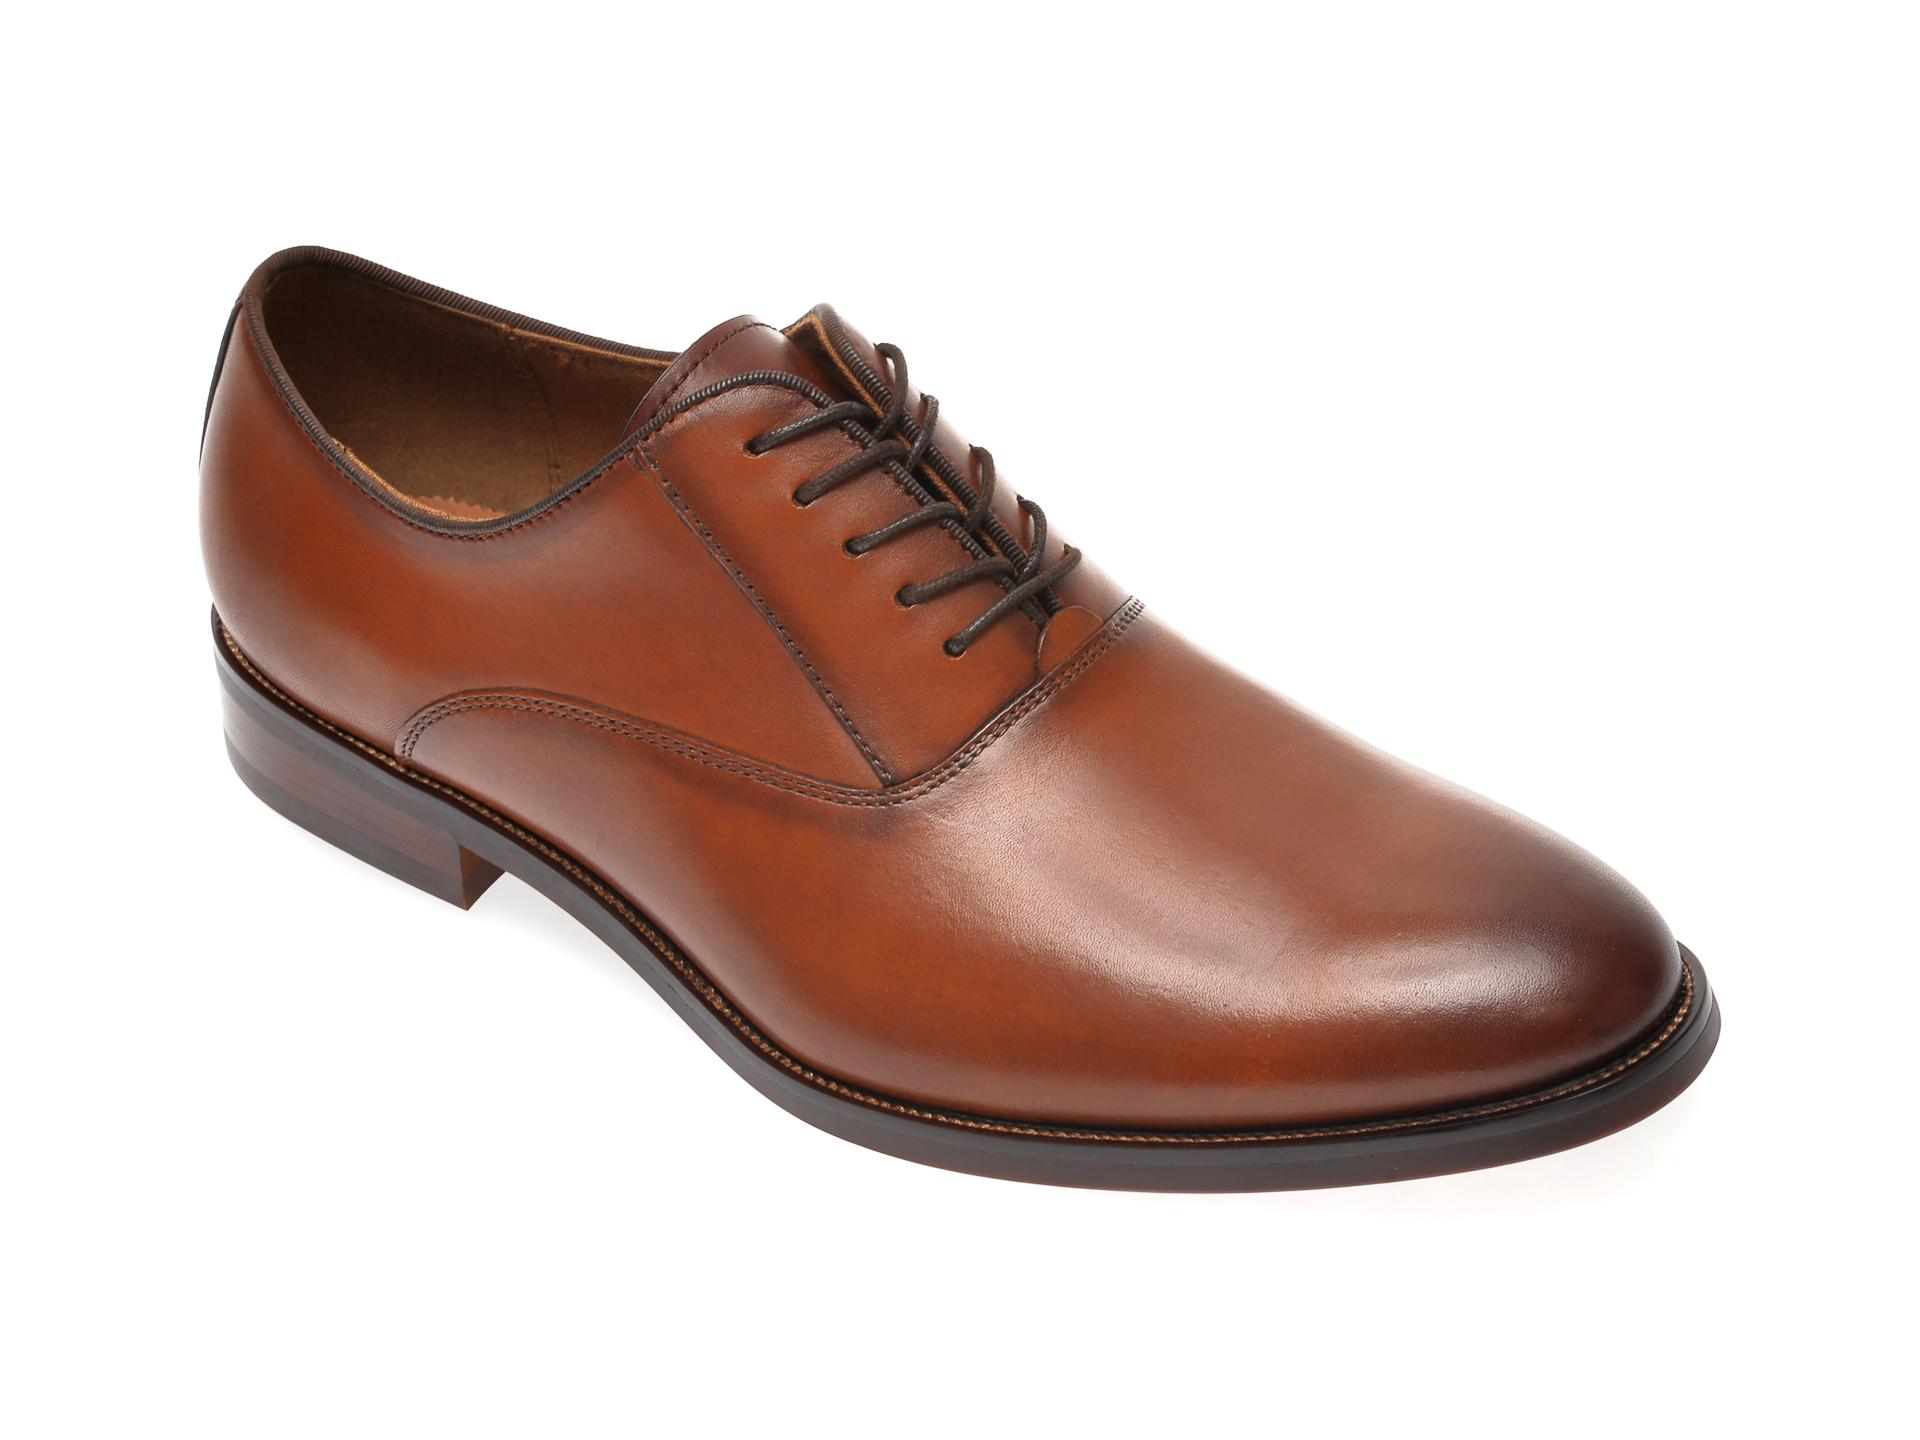 Pantofi ALDO maro, Eloie220, din piele naturala